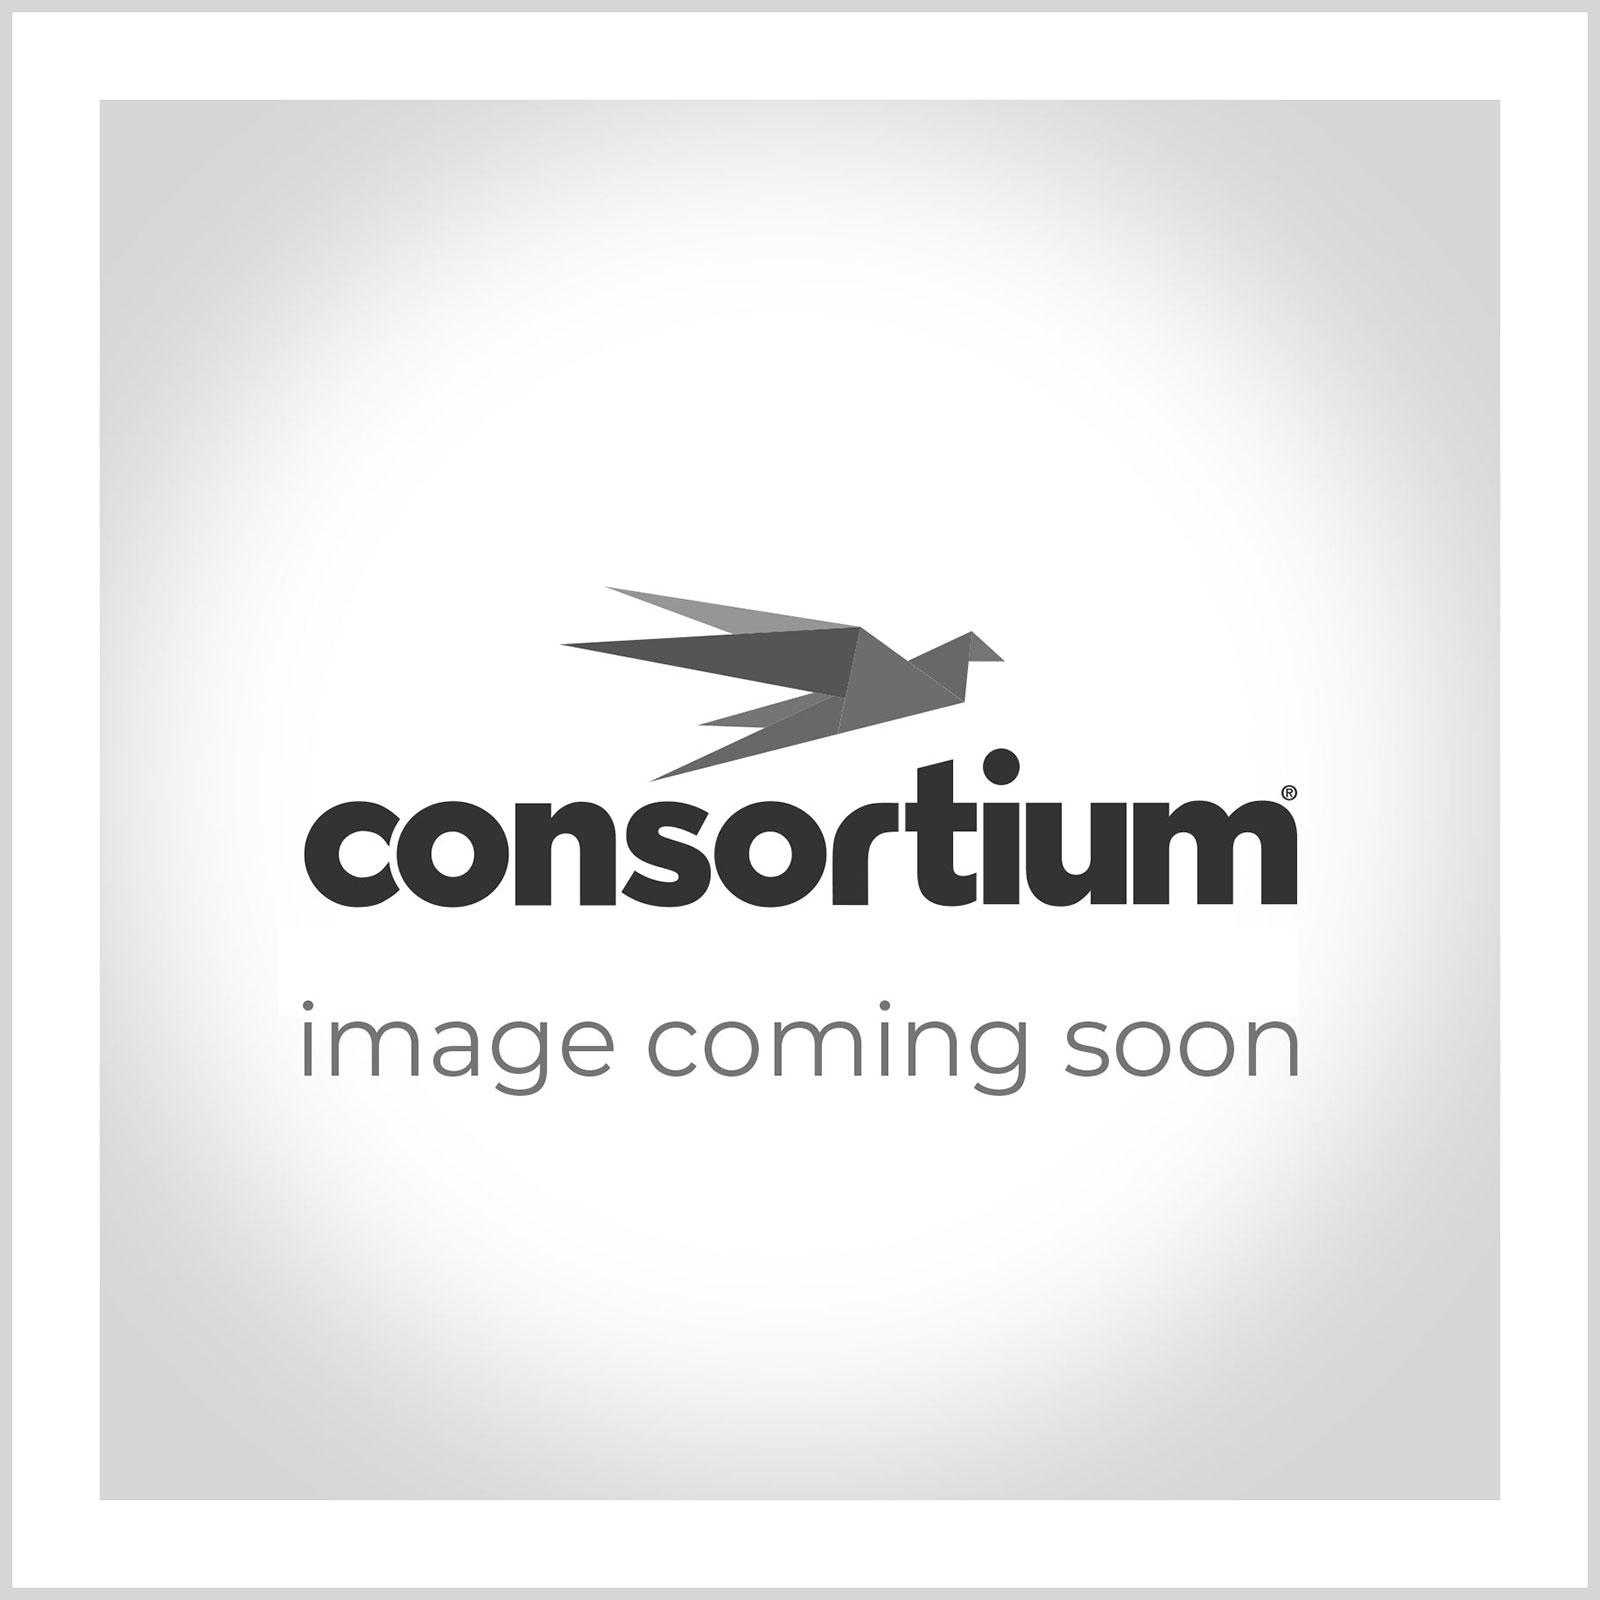 Non-spill Water/Paint Pots